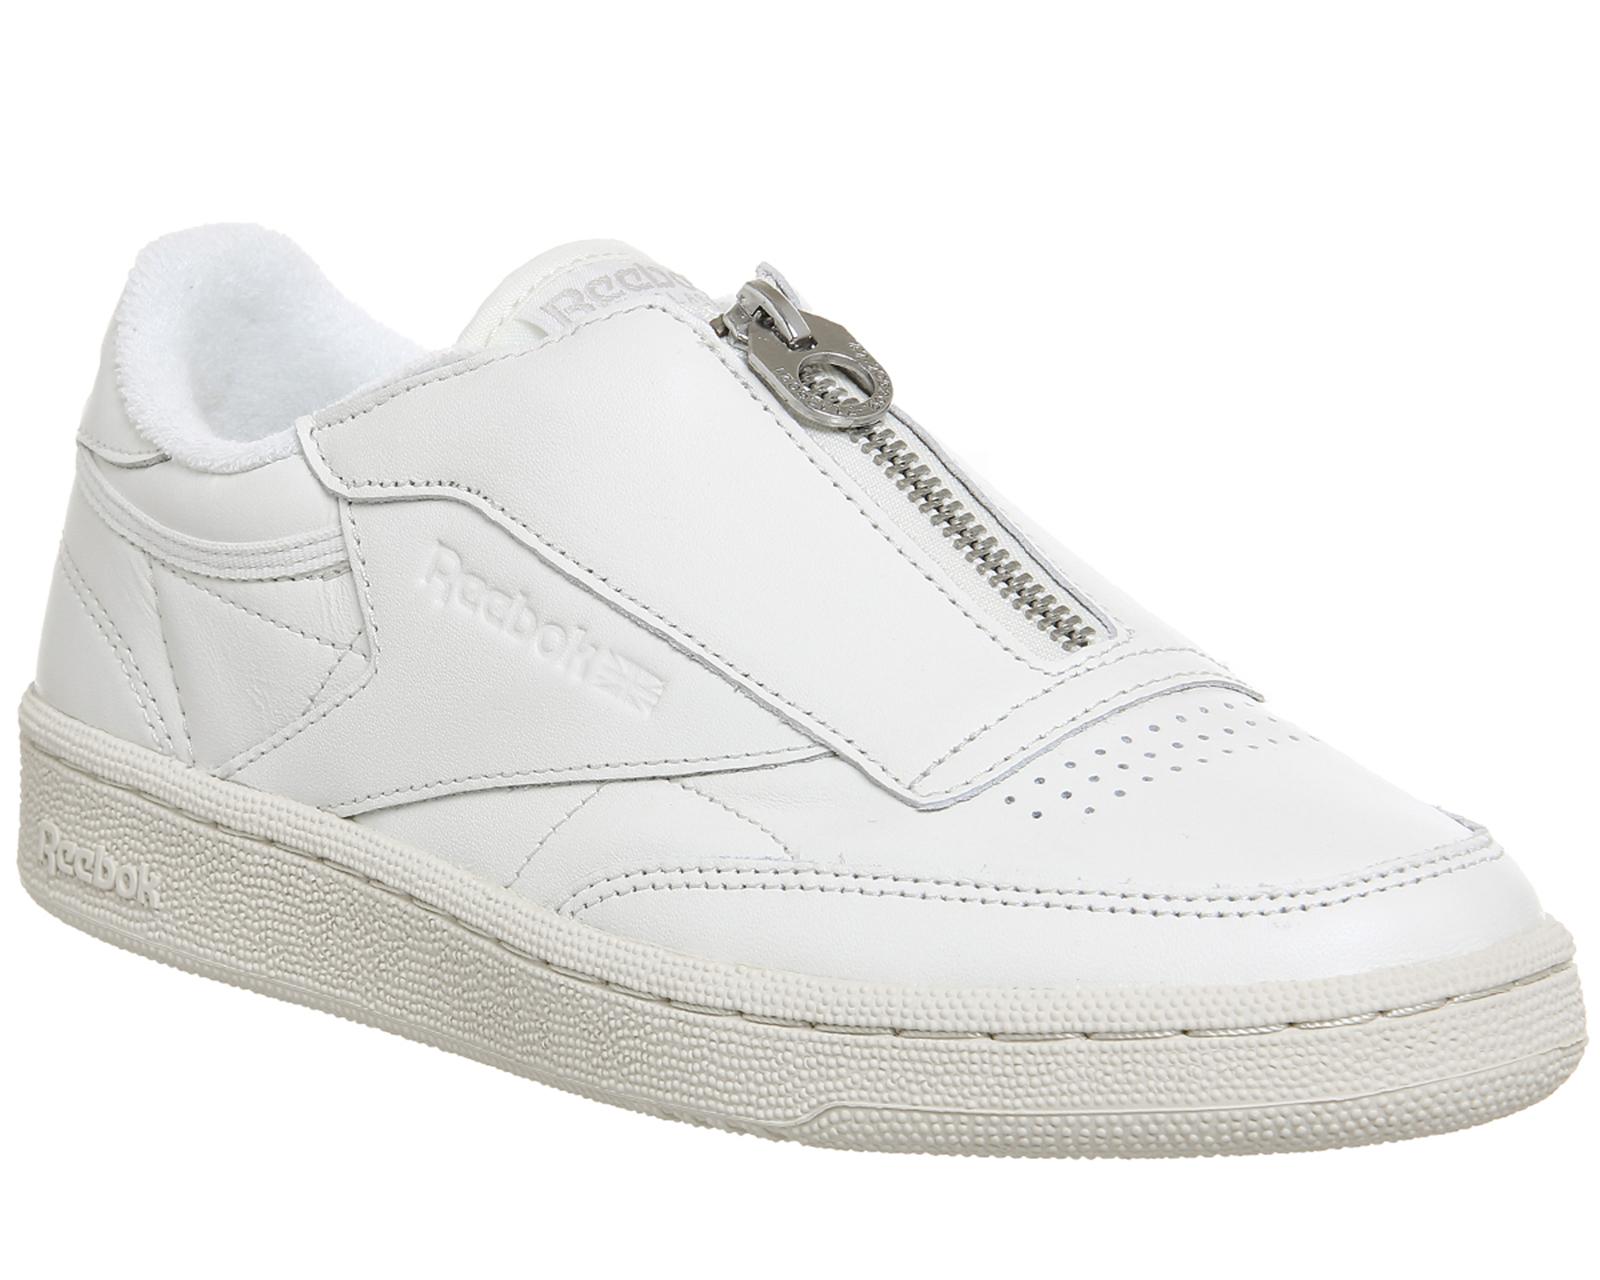 fd7ffb5502a95 Sentinel Womens Reebok Club C 85 Zip Chalk Sandstone Trainers Shoes